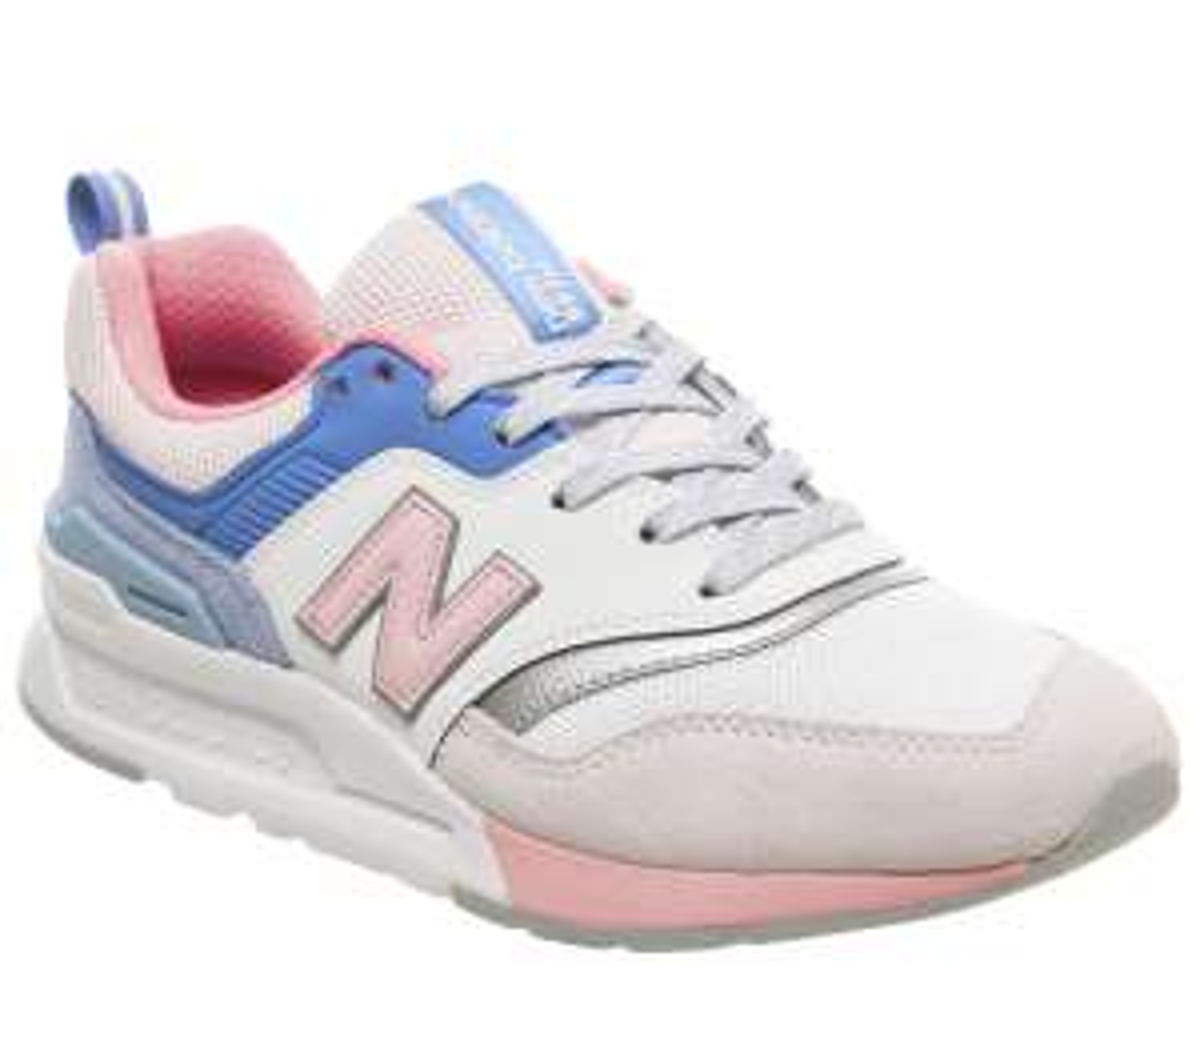 New Balance W997 Frauen Sneaker